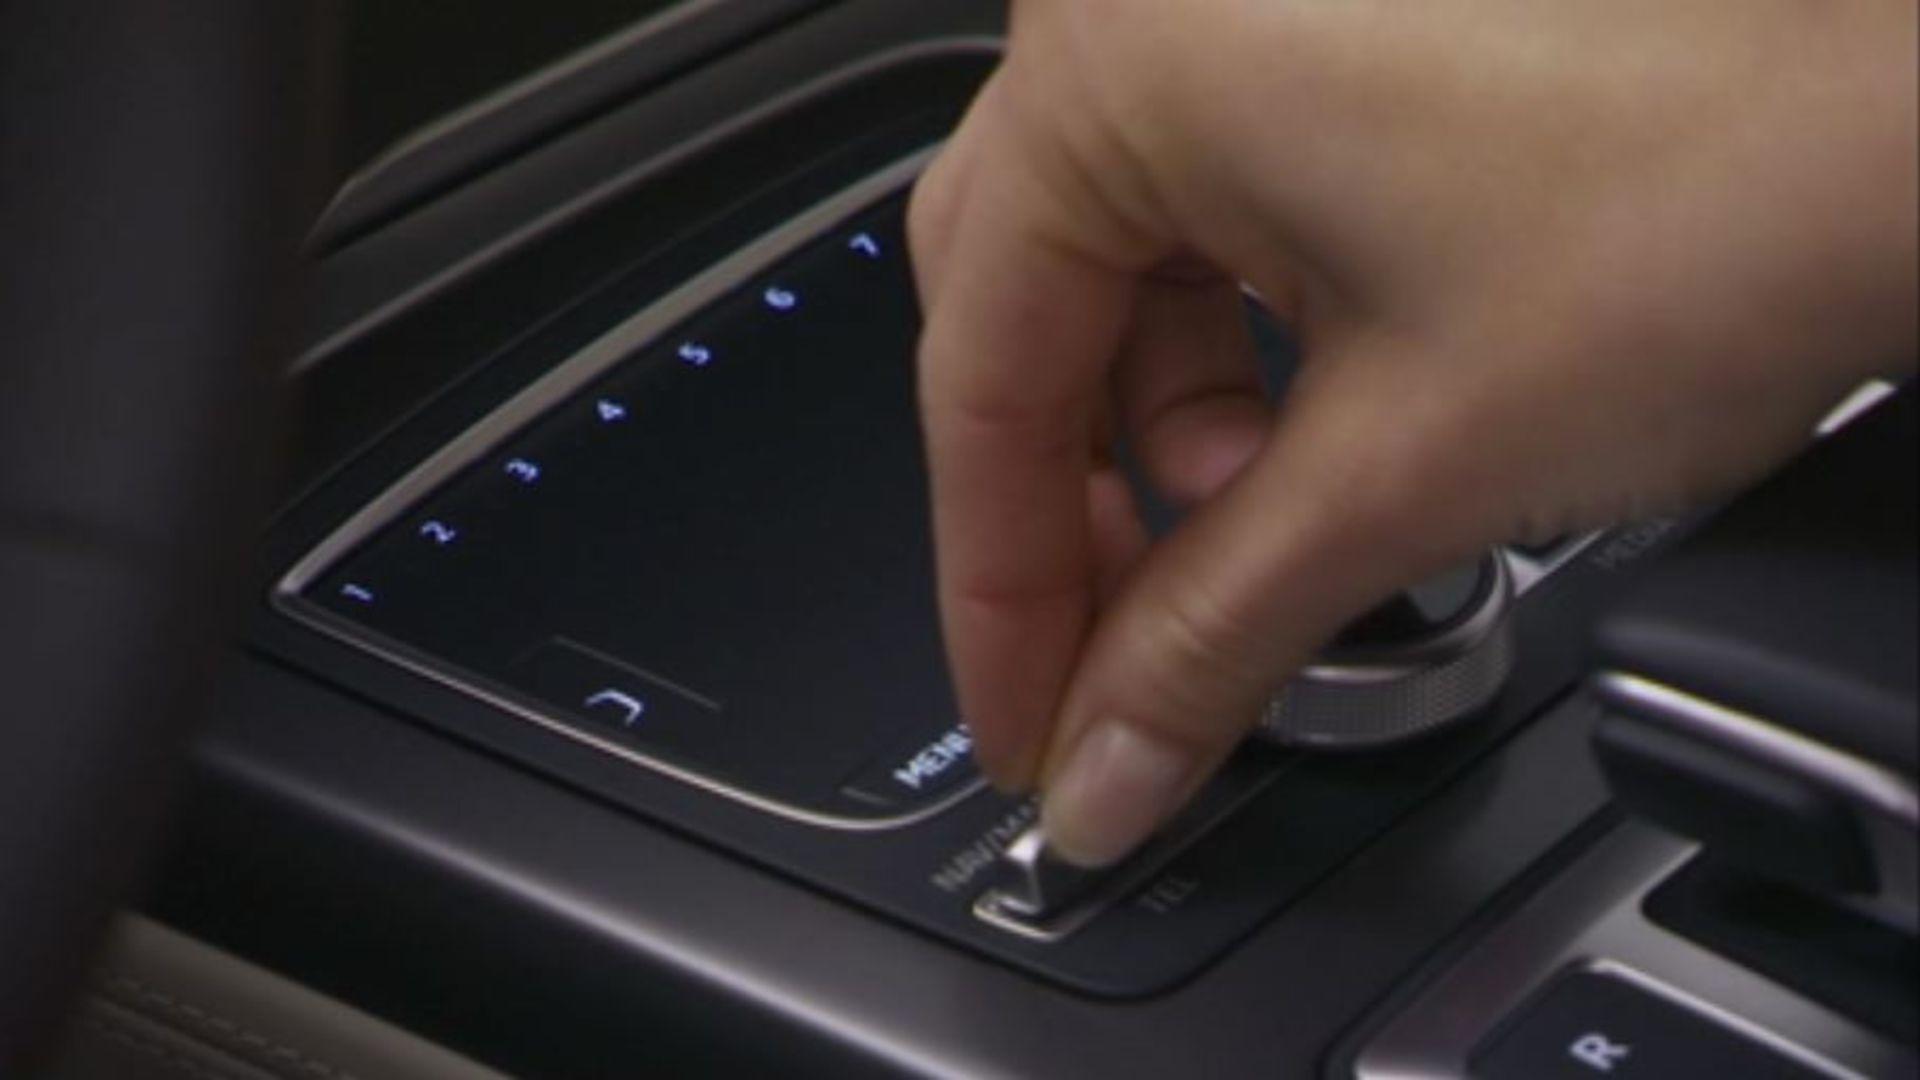 Audi Q7 - HMI